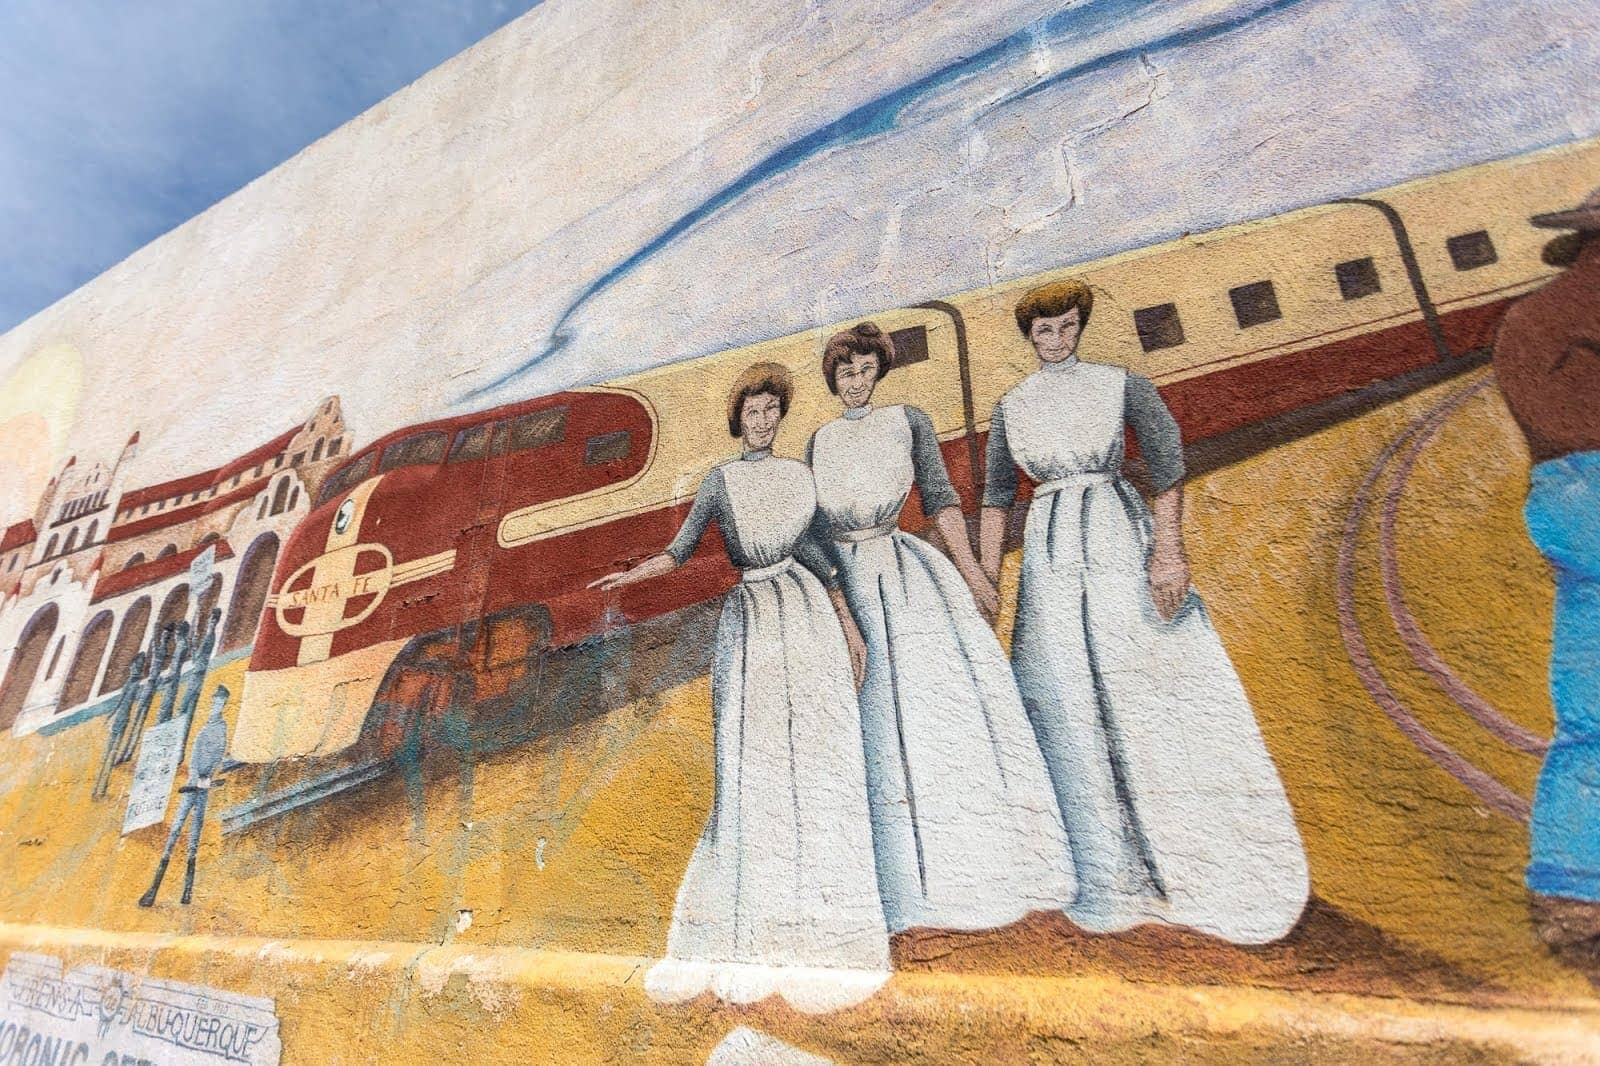 Street Art Albuquerque New Meixco_by_Laurence Norah-2